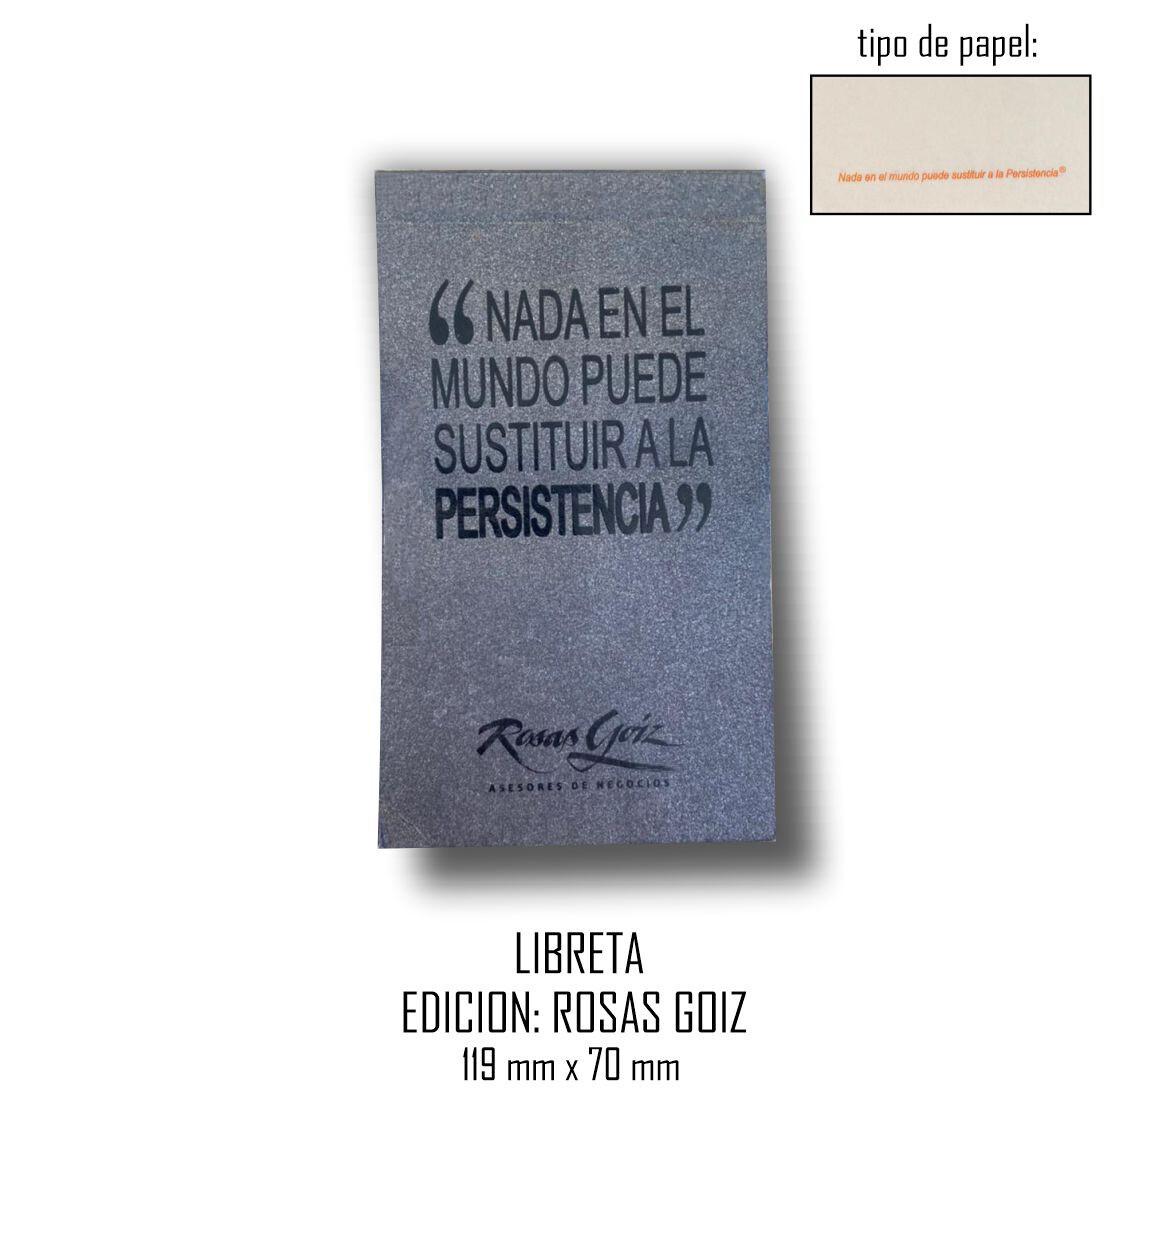 Libreta Edición: Rosas Goiz 119 mm x 70 mm